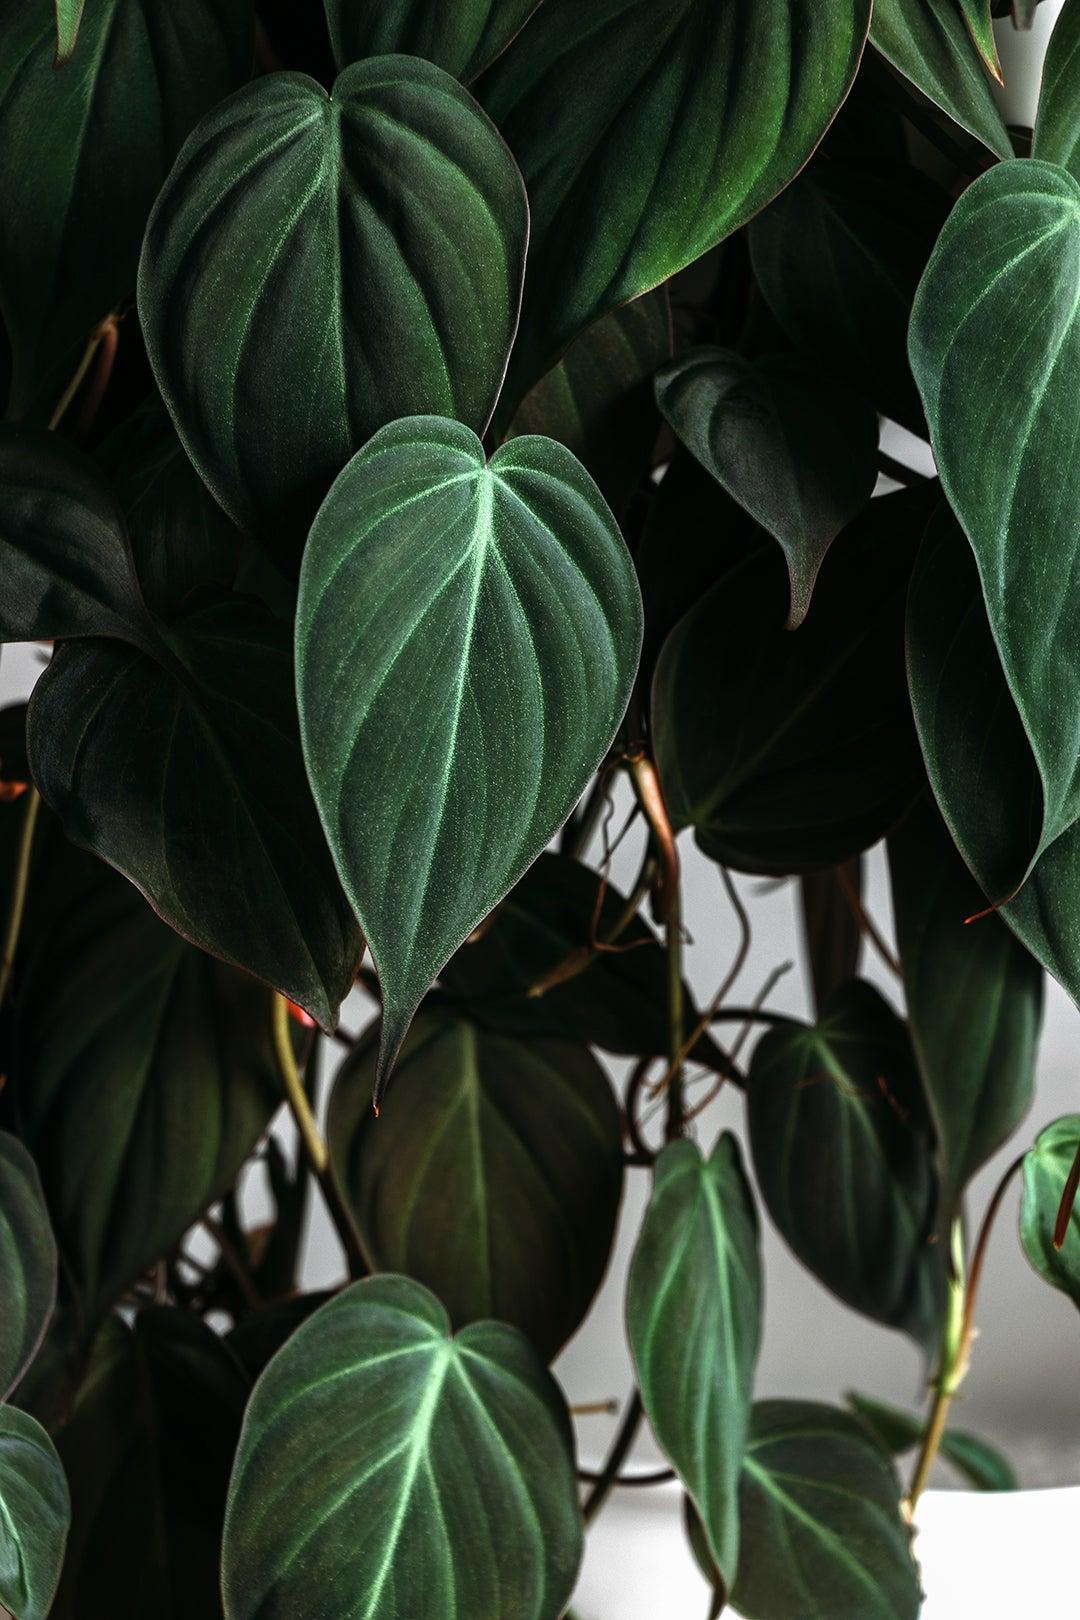 heart shaped plant leaves